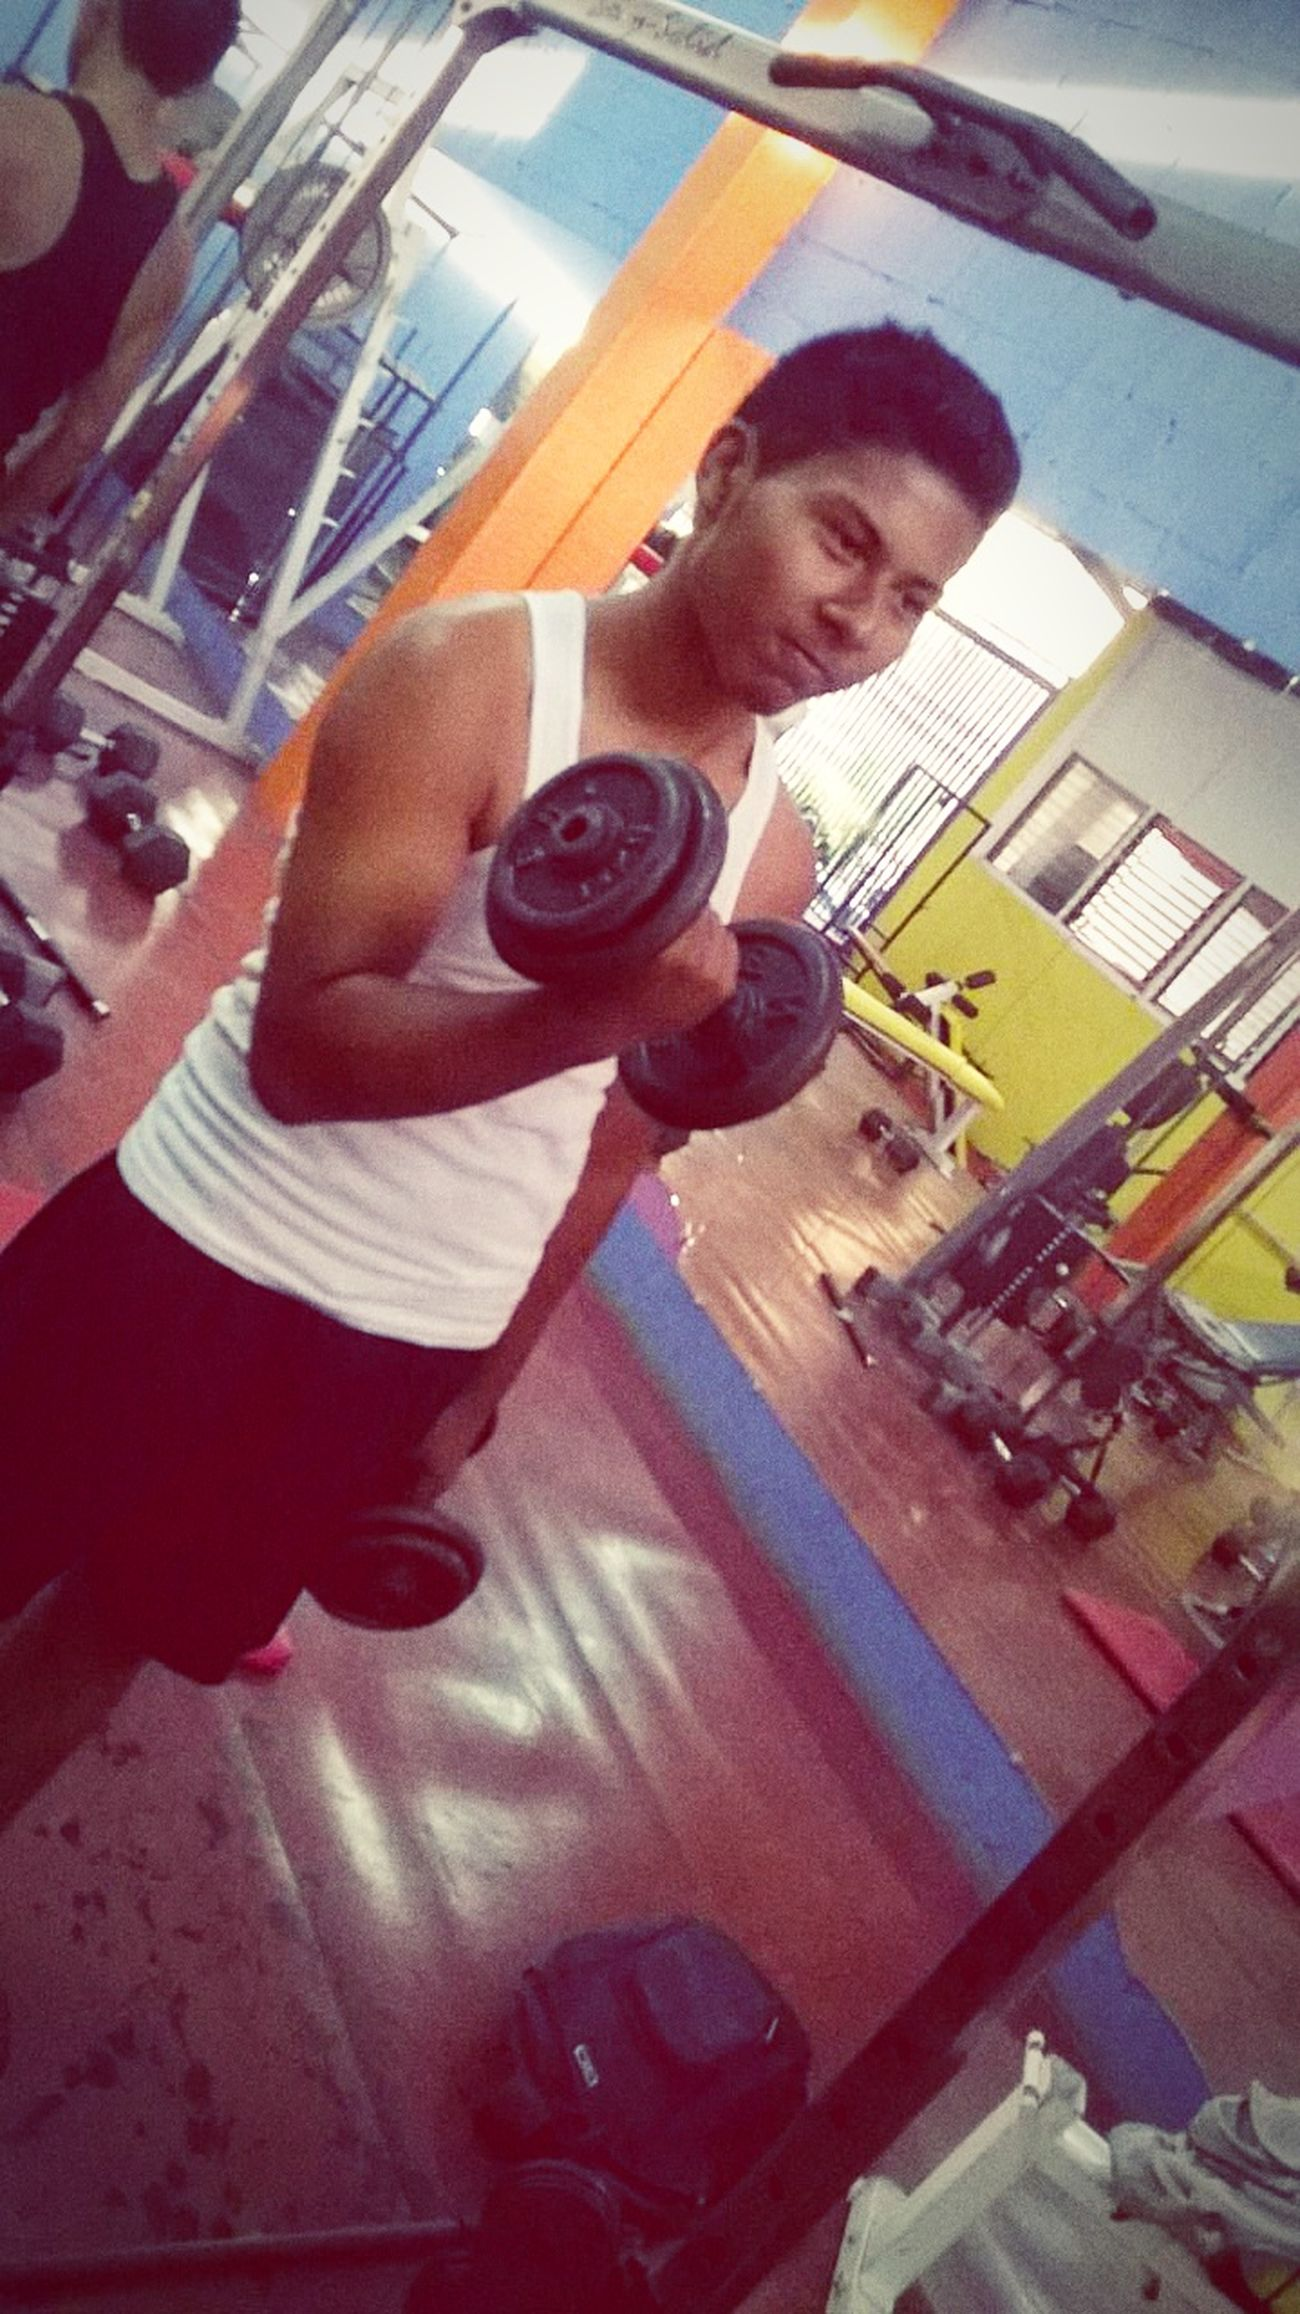 ¡Ay vamos! 😆💪 Gym!